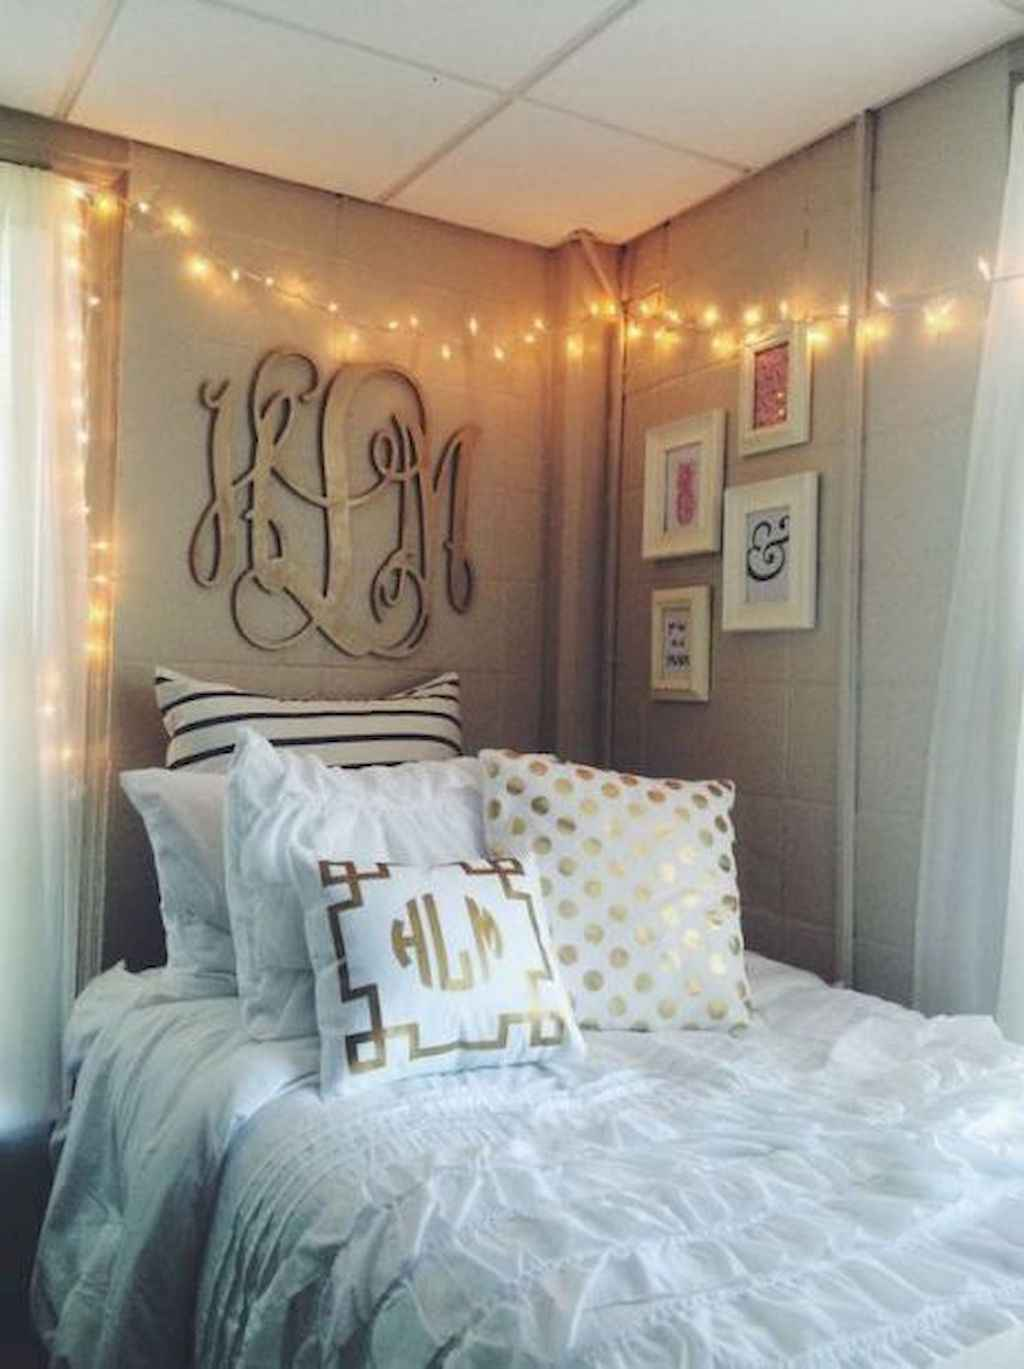 Cute diy dorm room decorating ideas on a budget (11)